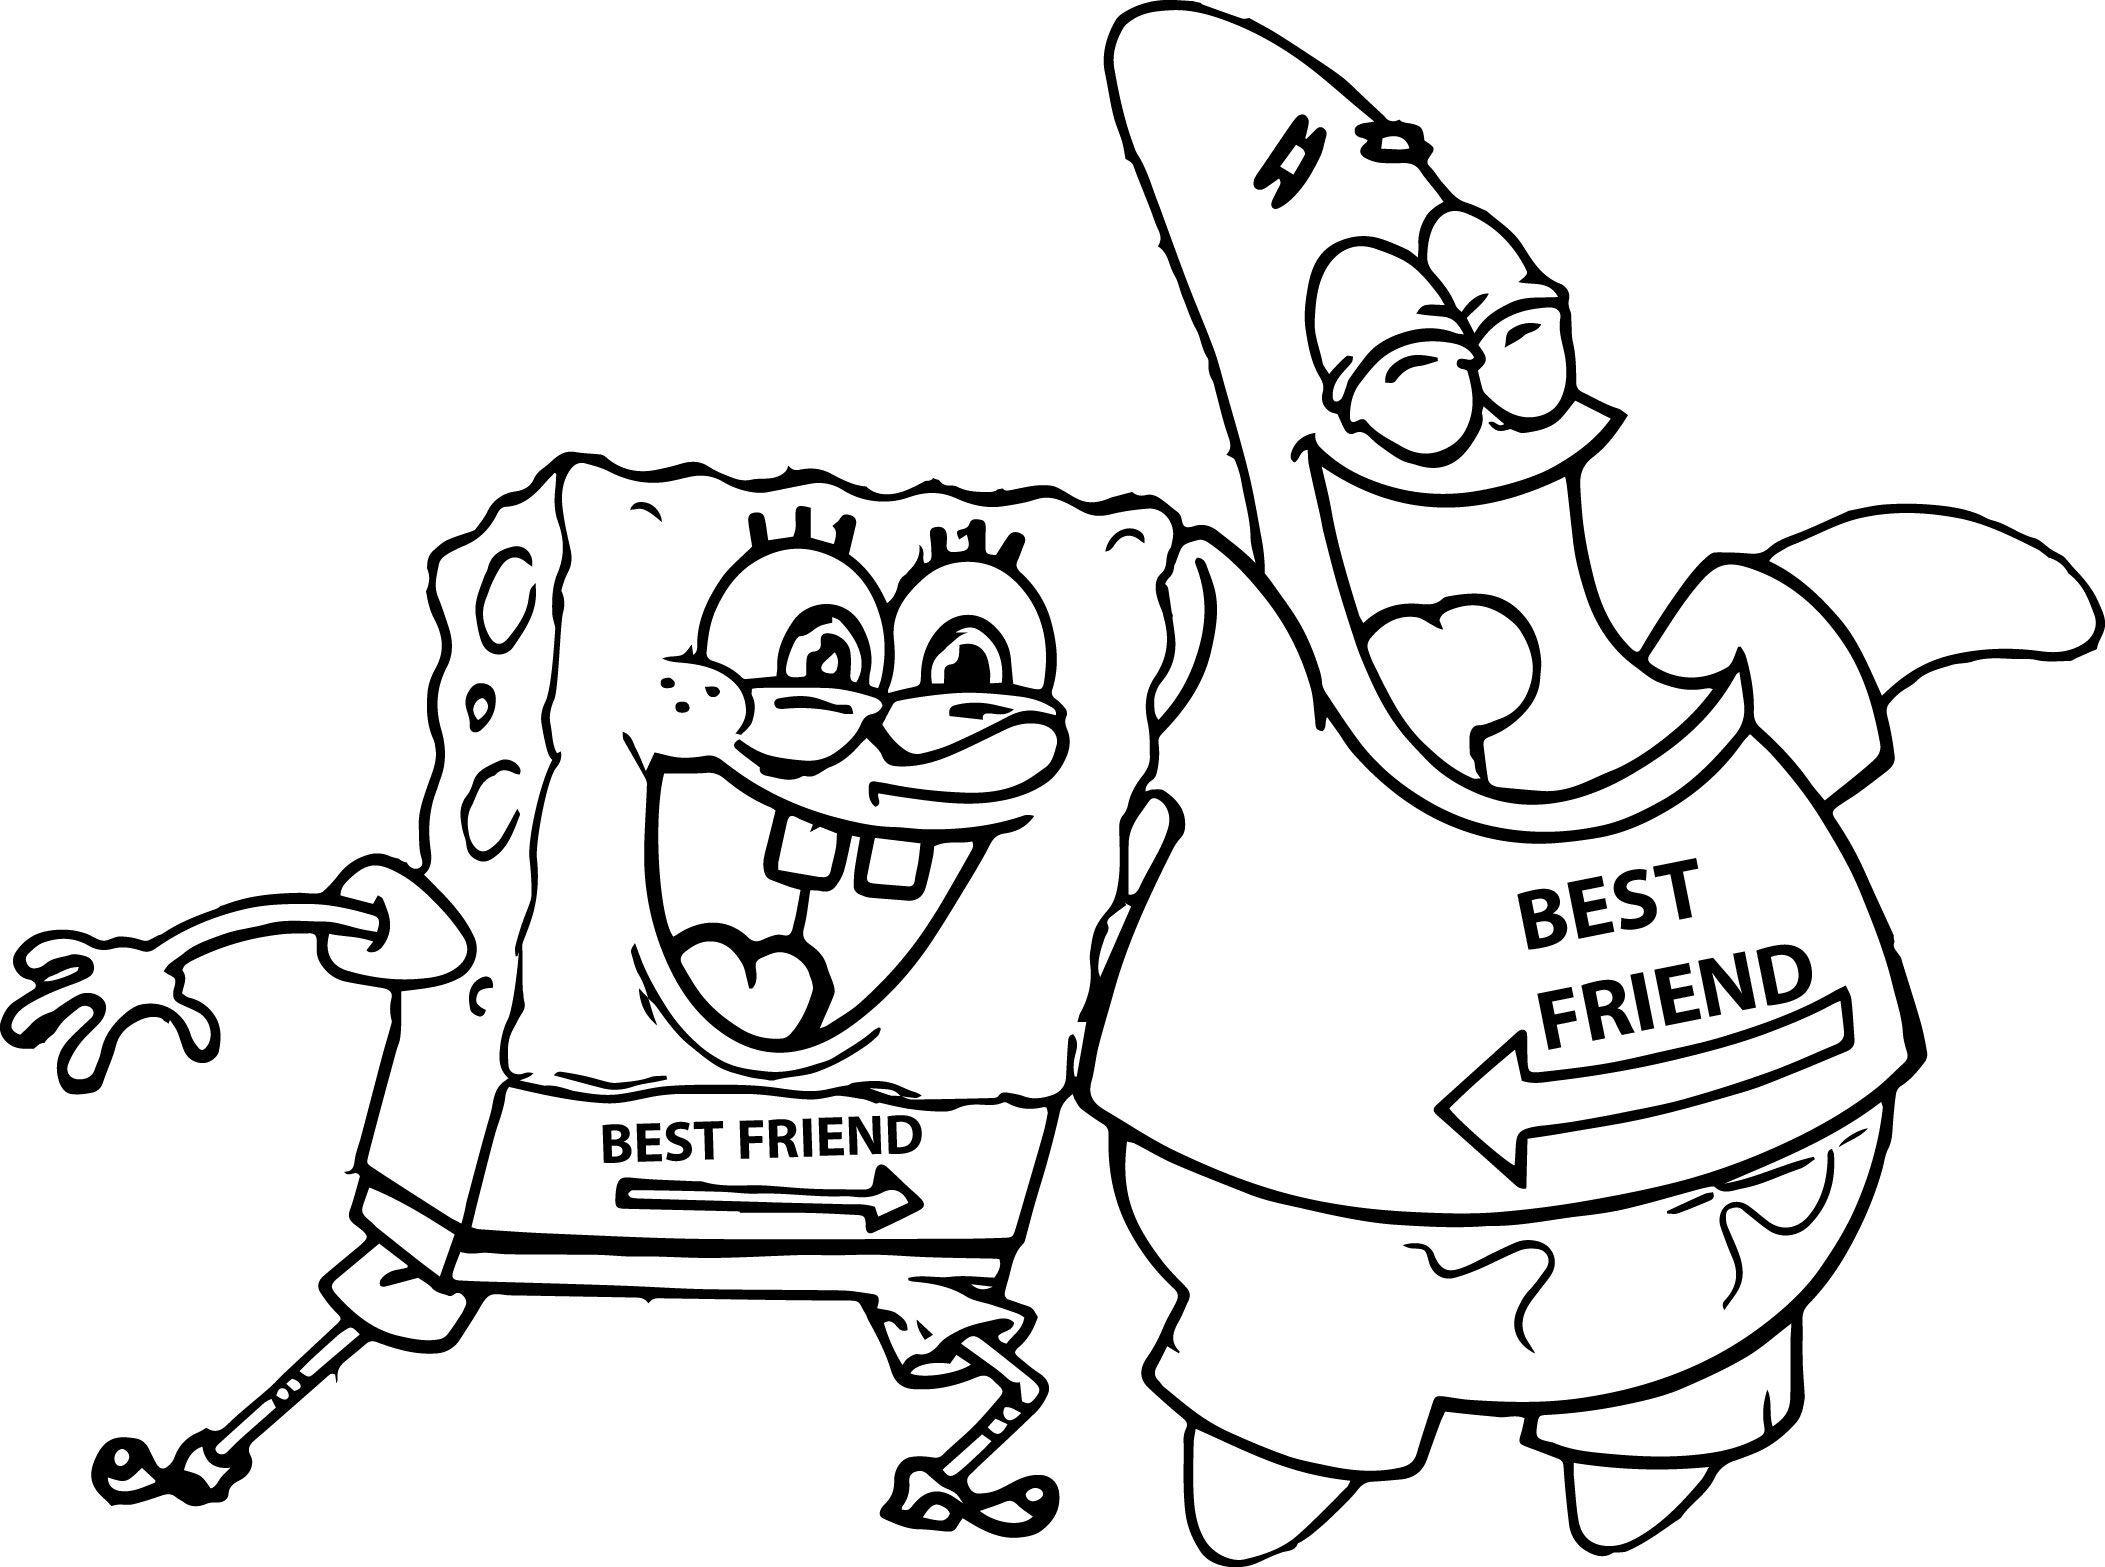 Printable Spongebob Squarepants Coloring Pages For Kids Online Best Of Sponge Bob Spongebob Drawings Cartoon Coloring Pages Drawings Of Friends